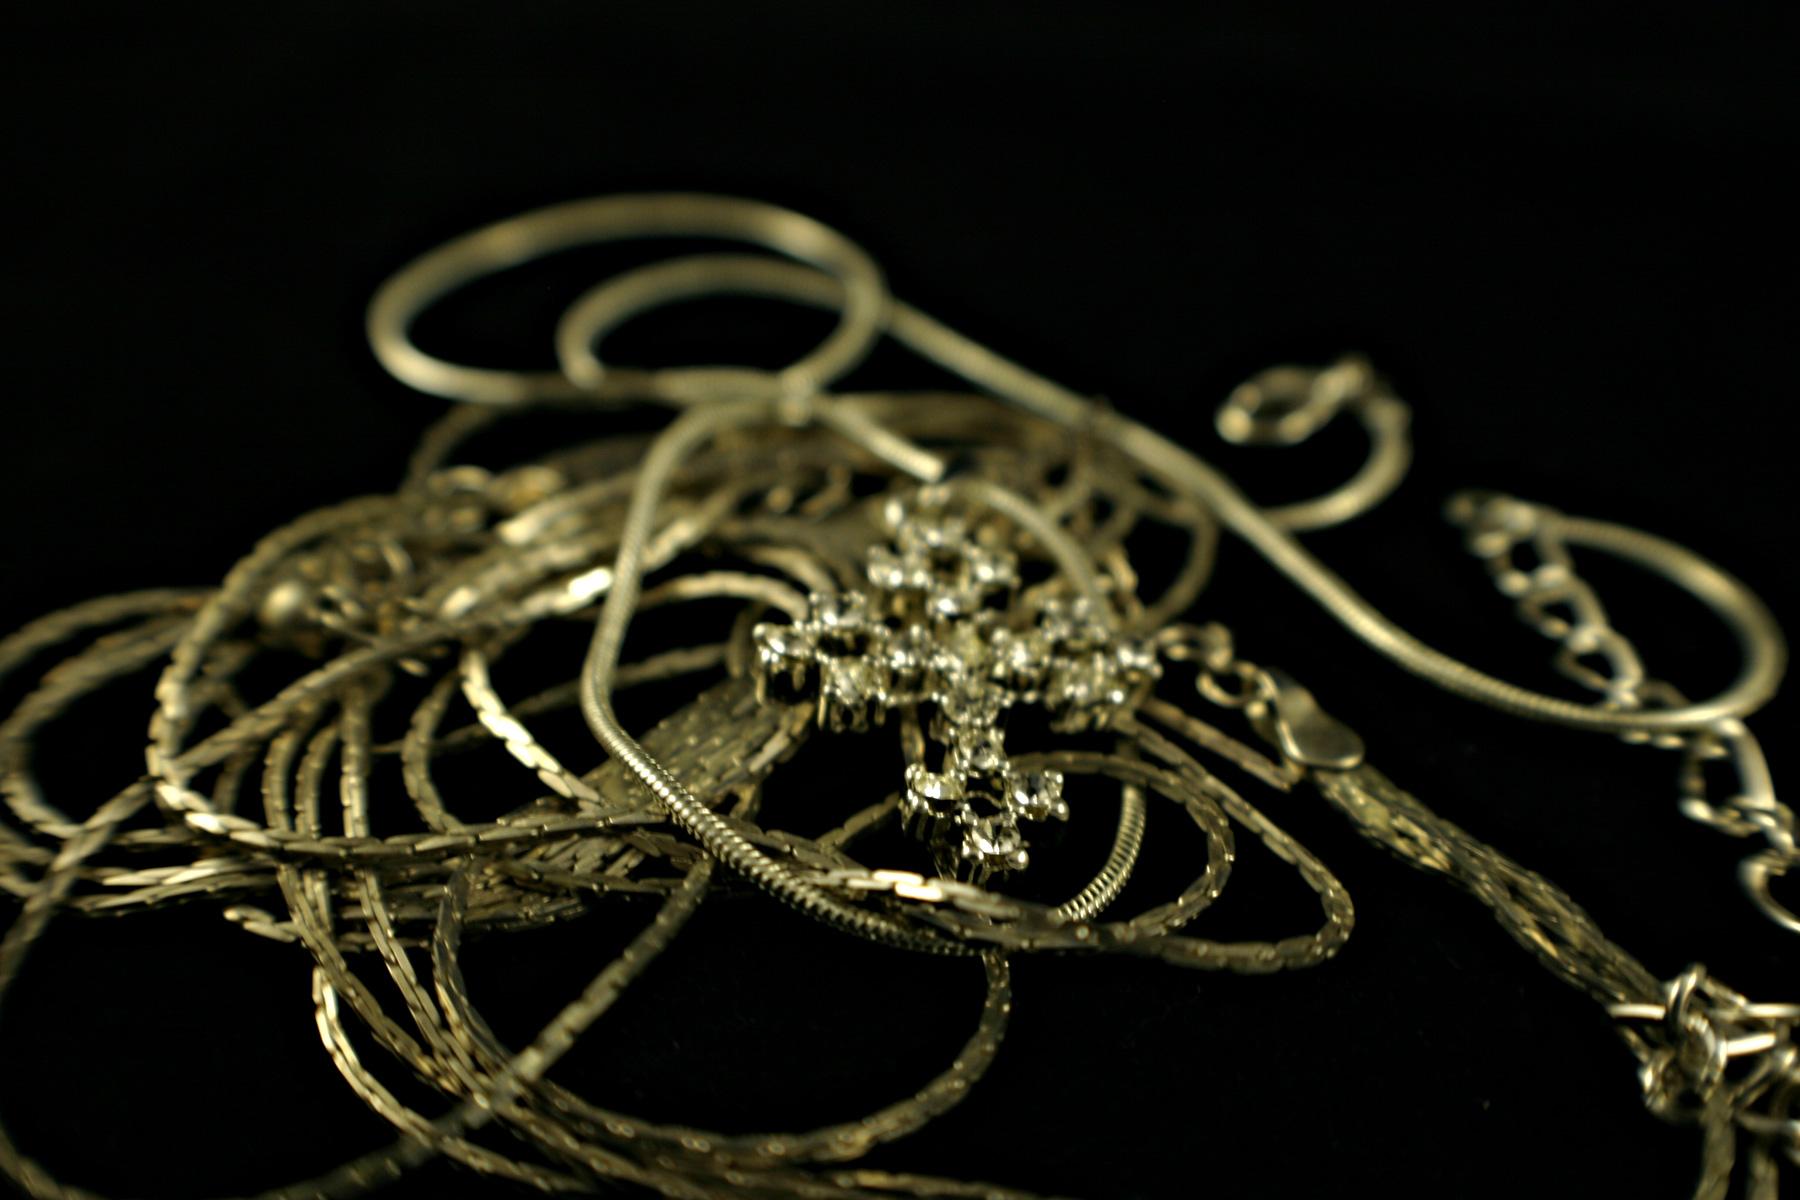 Cross lying on chains photo